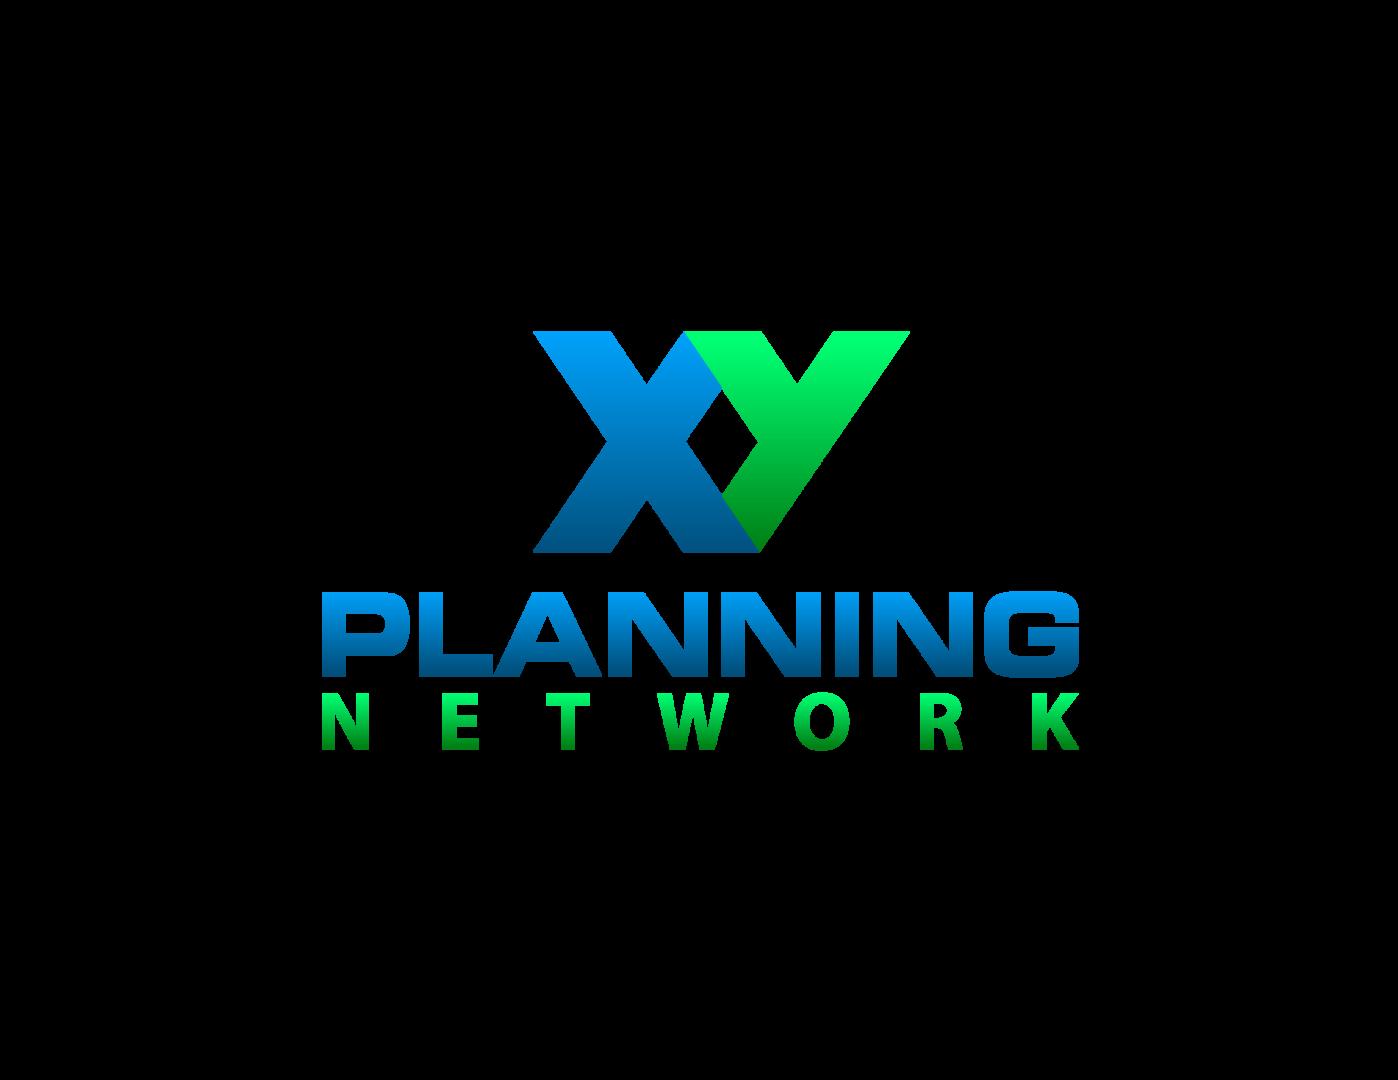 https://familyfirstwealthmanagement.com/wp-content/uploads/2020/08/logo2.png